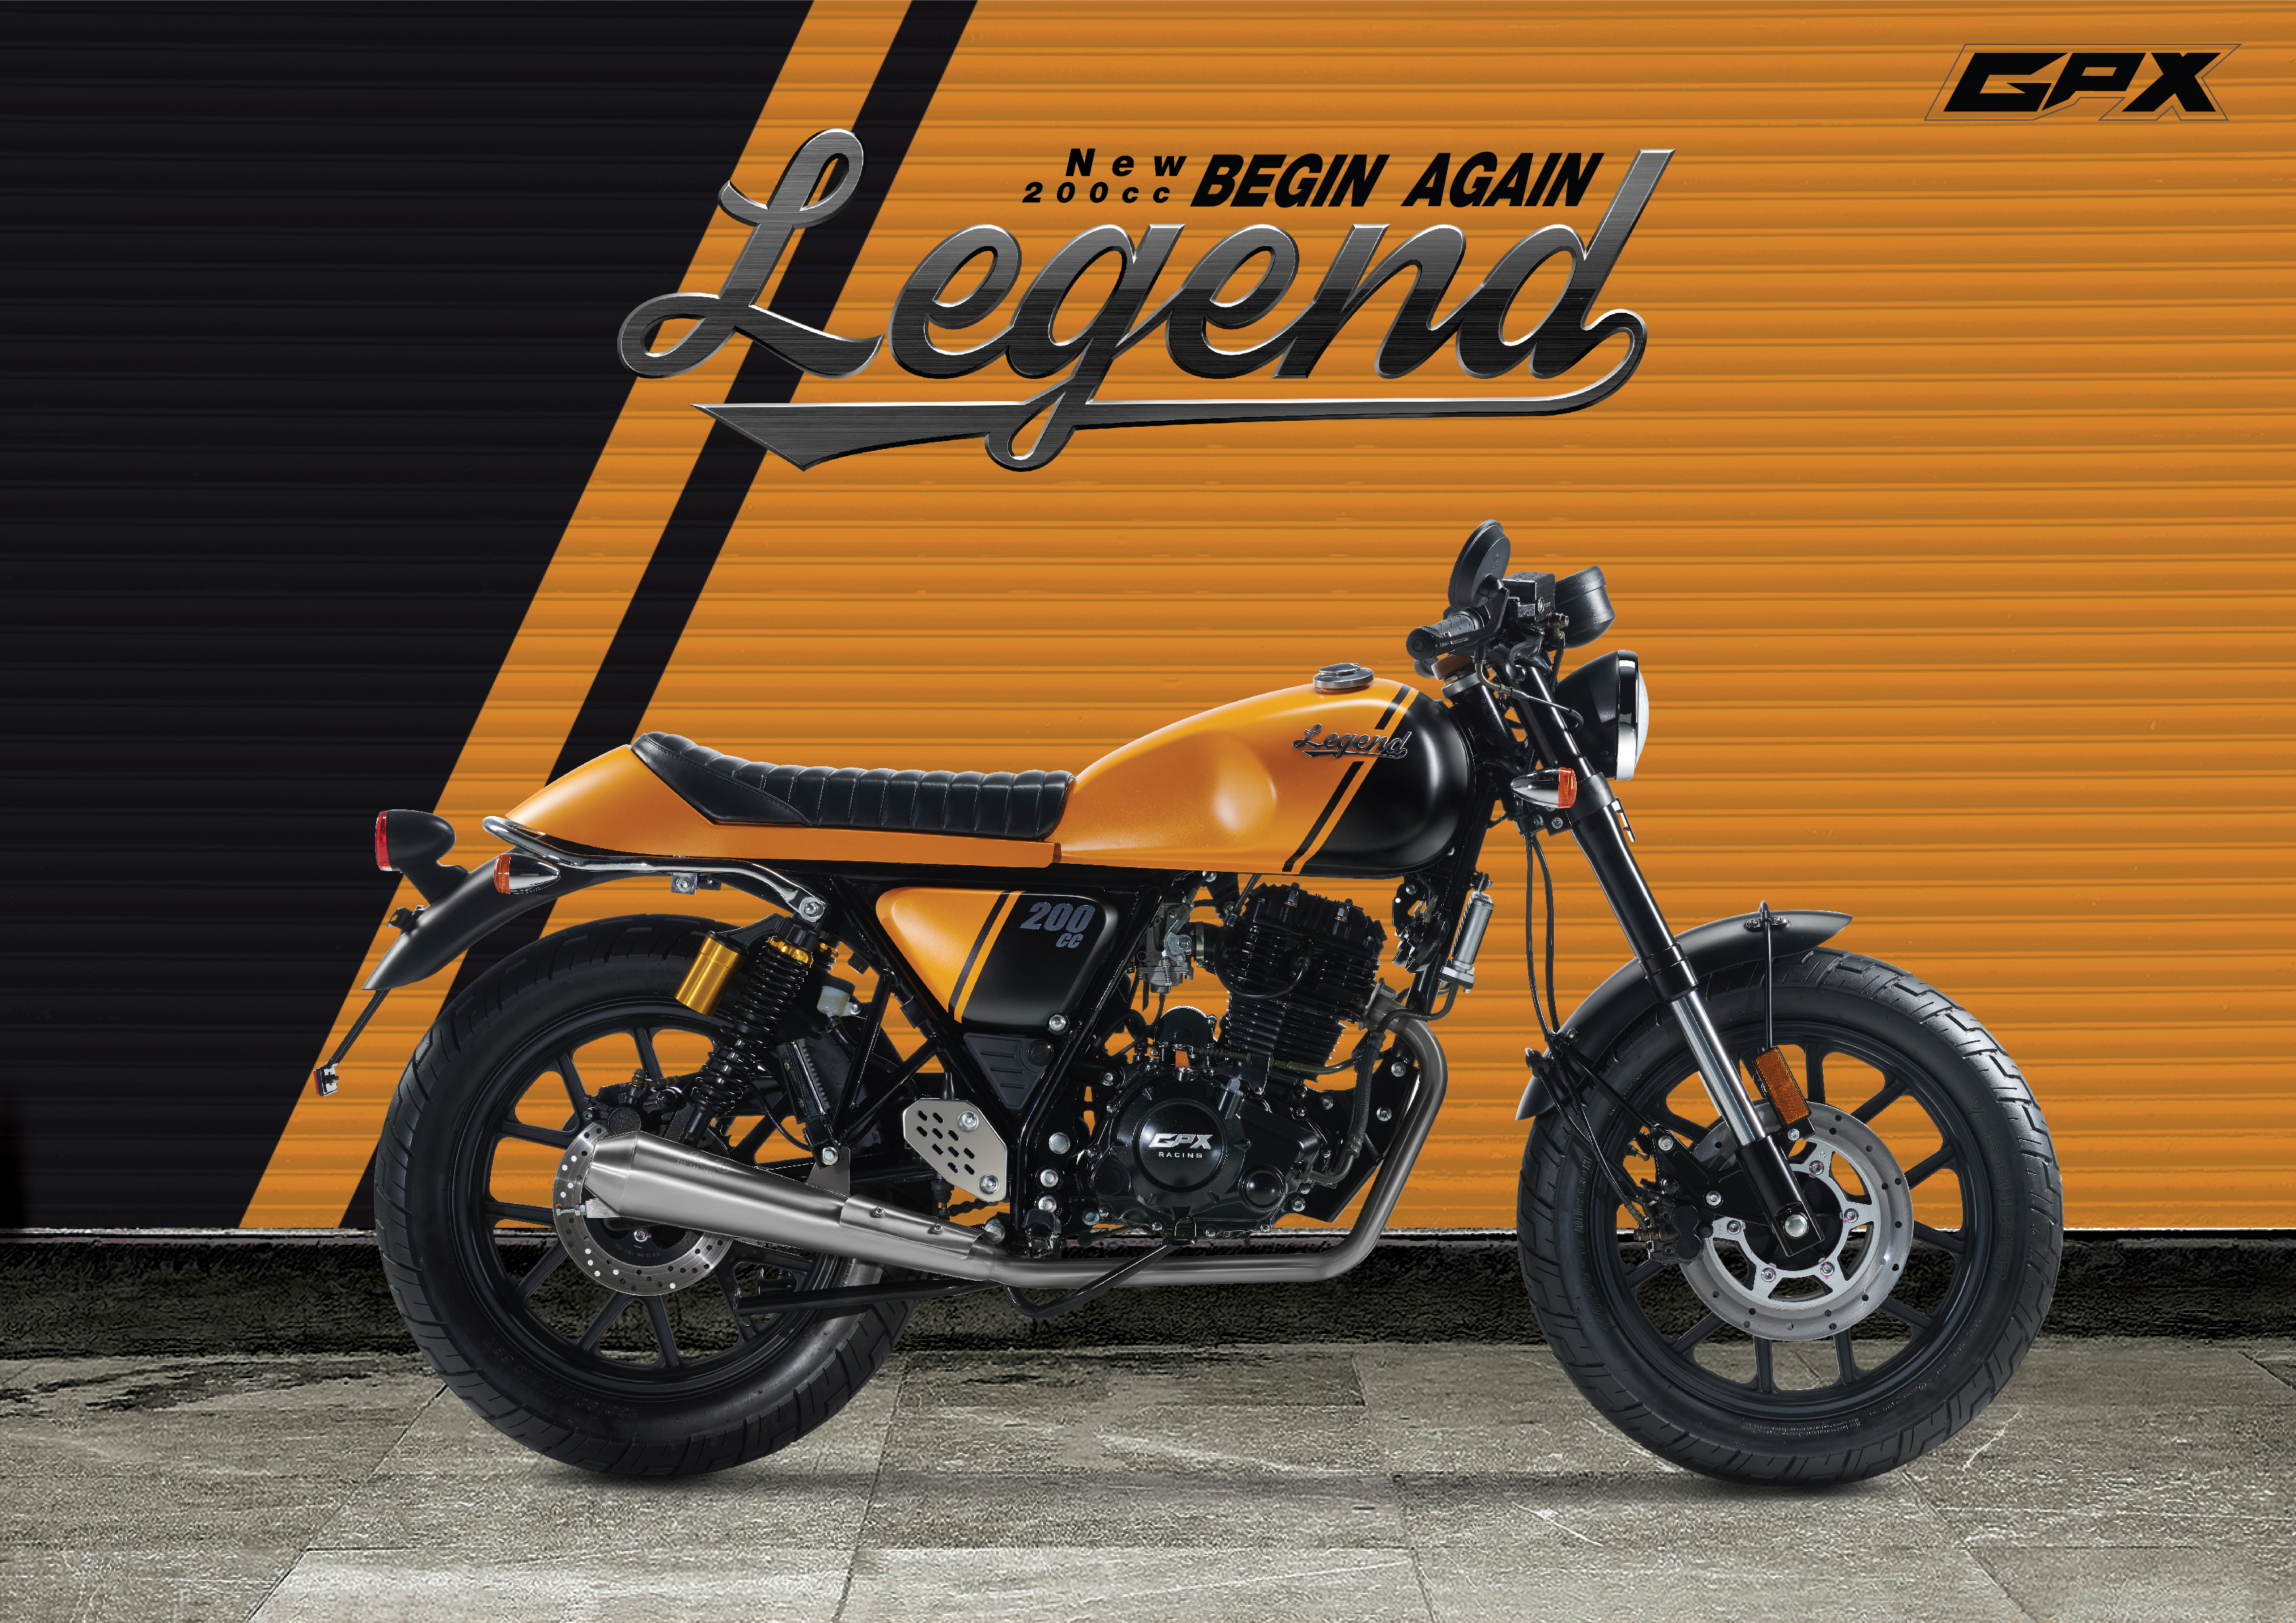 gpx legend 200